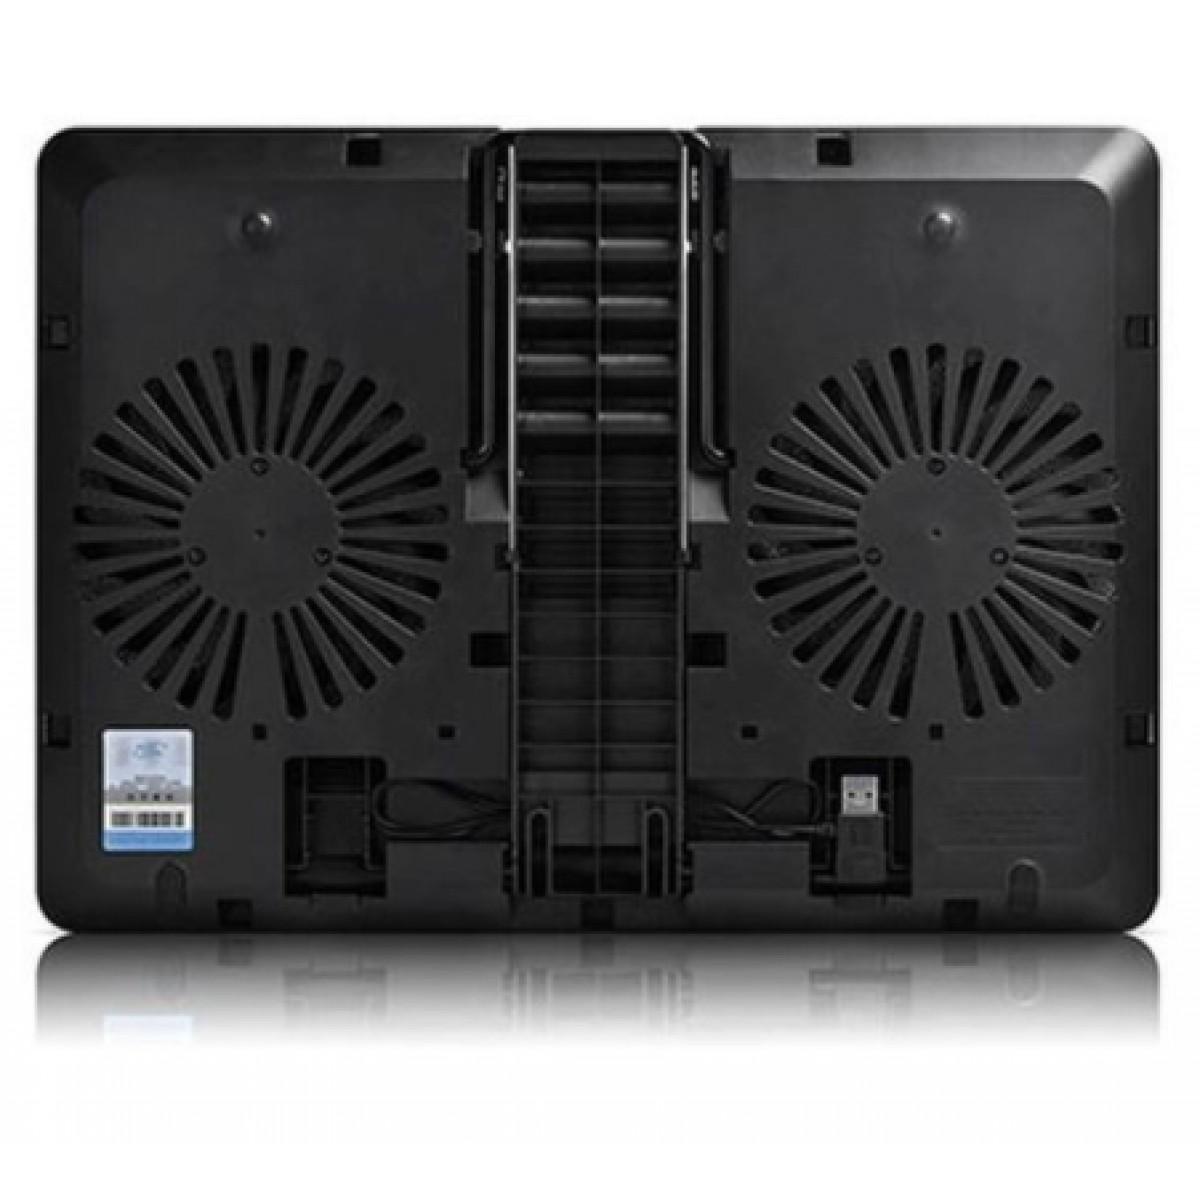 "Base para Notebook Deepcool, U PAL, Ajustável, 15,6"", 2 Fans, Black, DP-N214A5-UPAL"